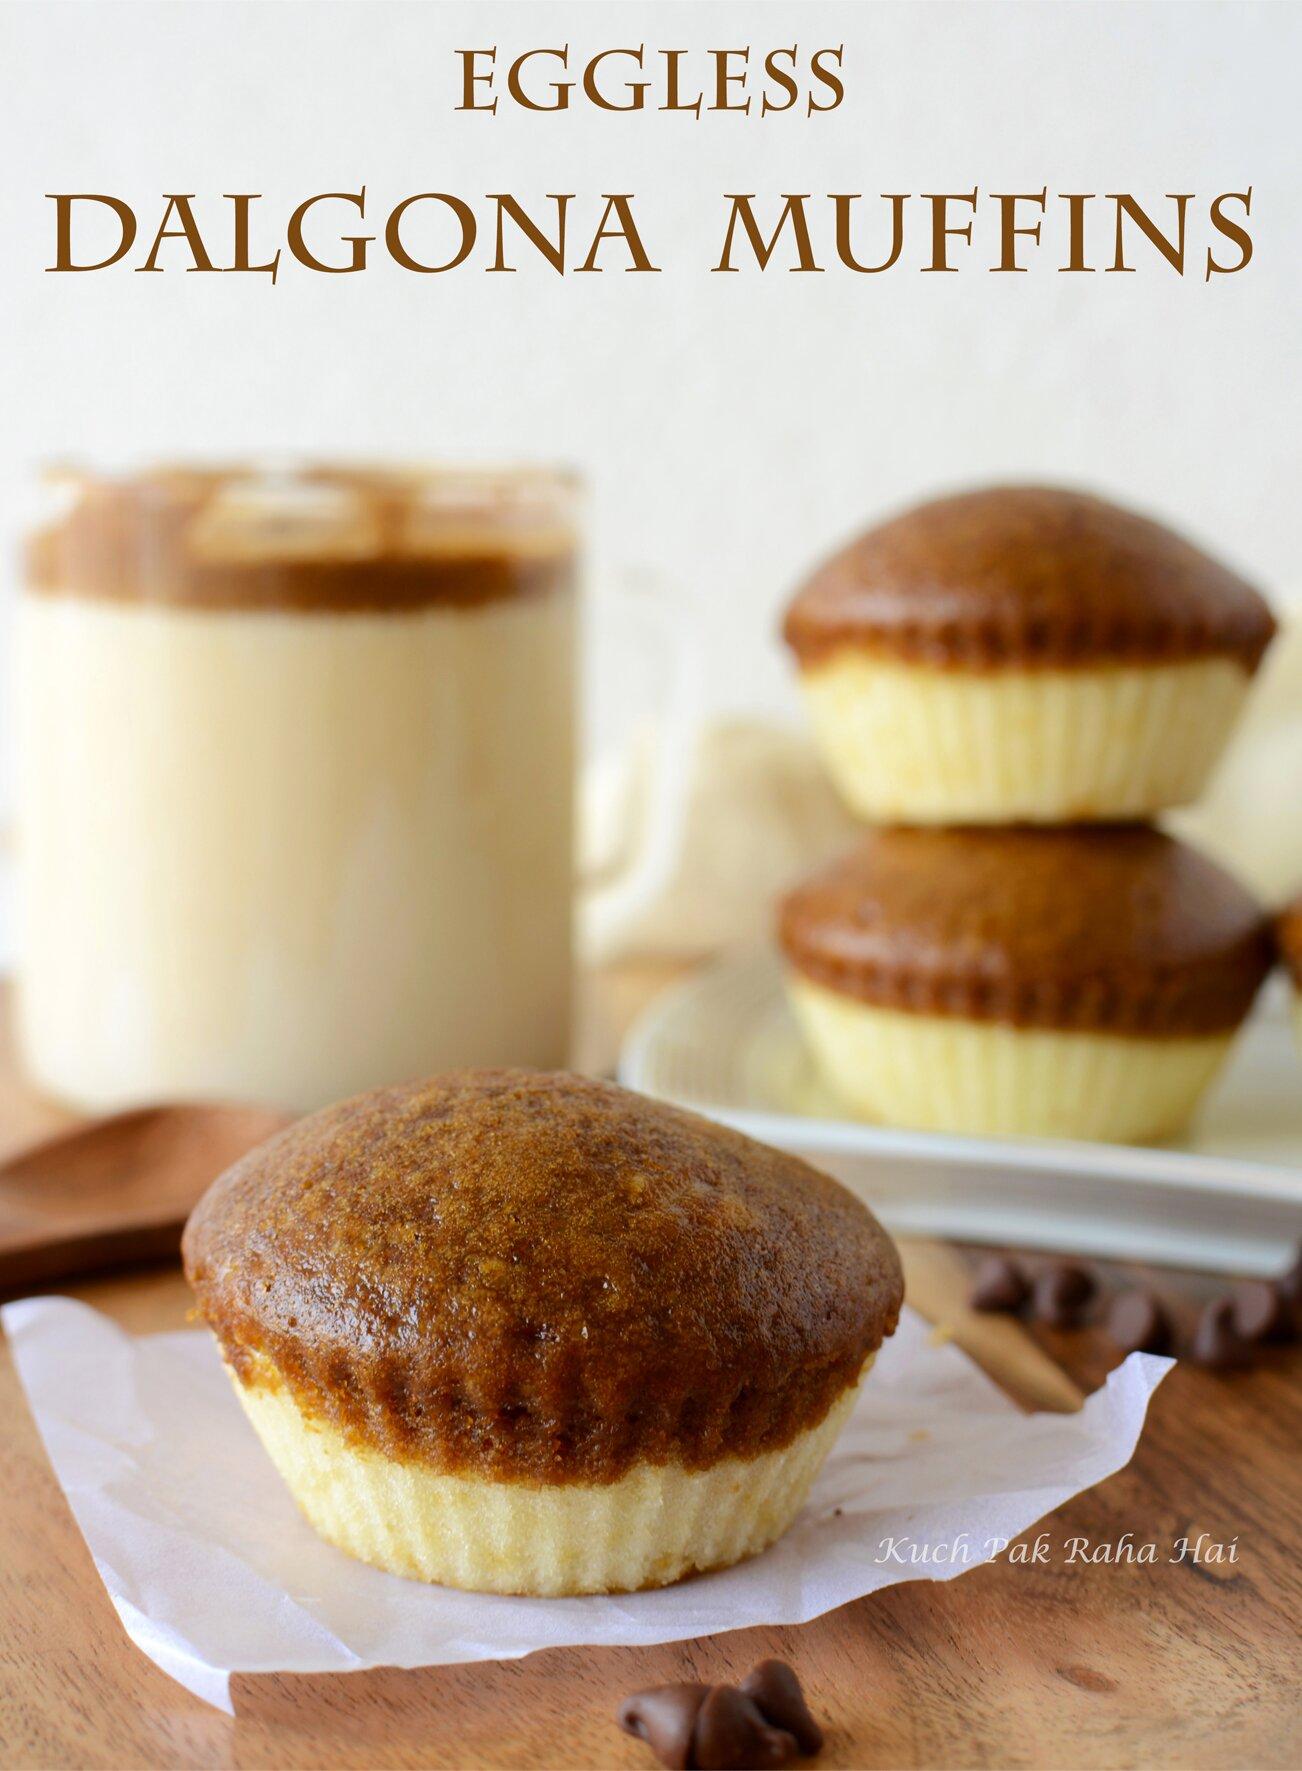 Eggless Dalgona Coffee Muffins Cupcakes